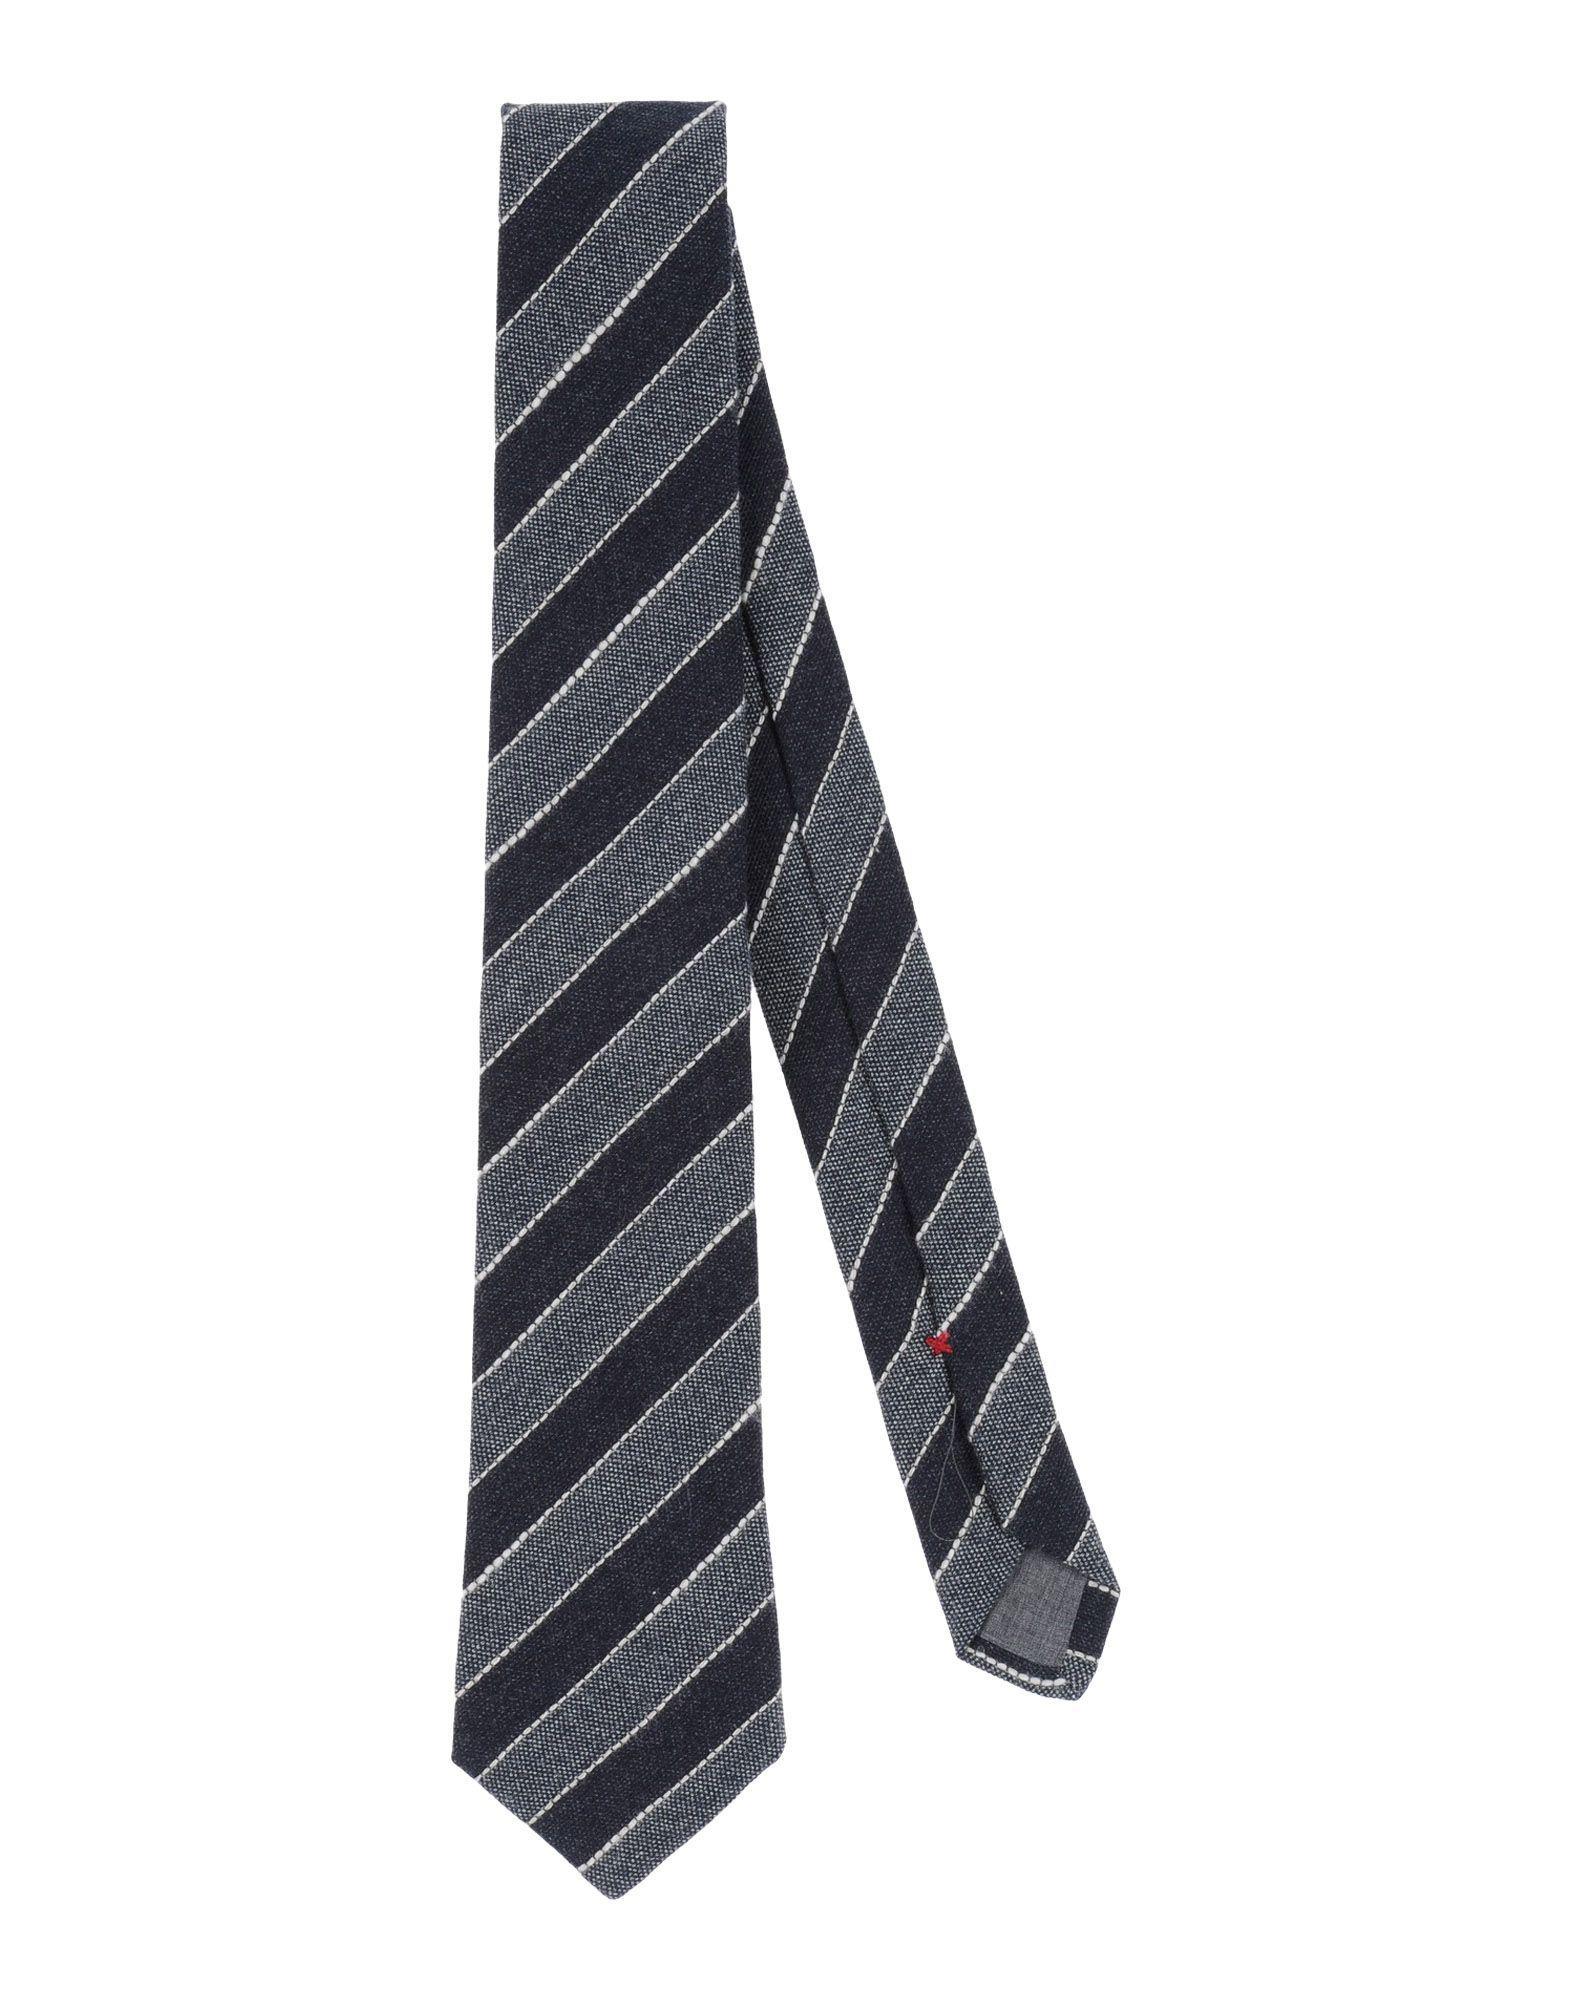 Brunello Cucinelli Tie In Steel Grey